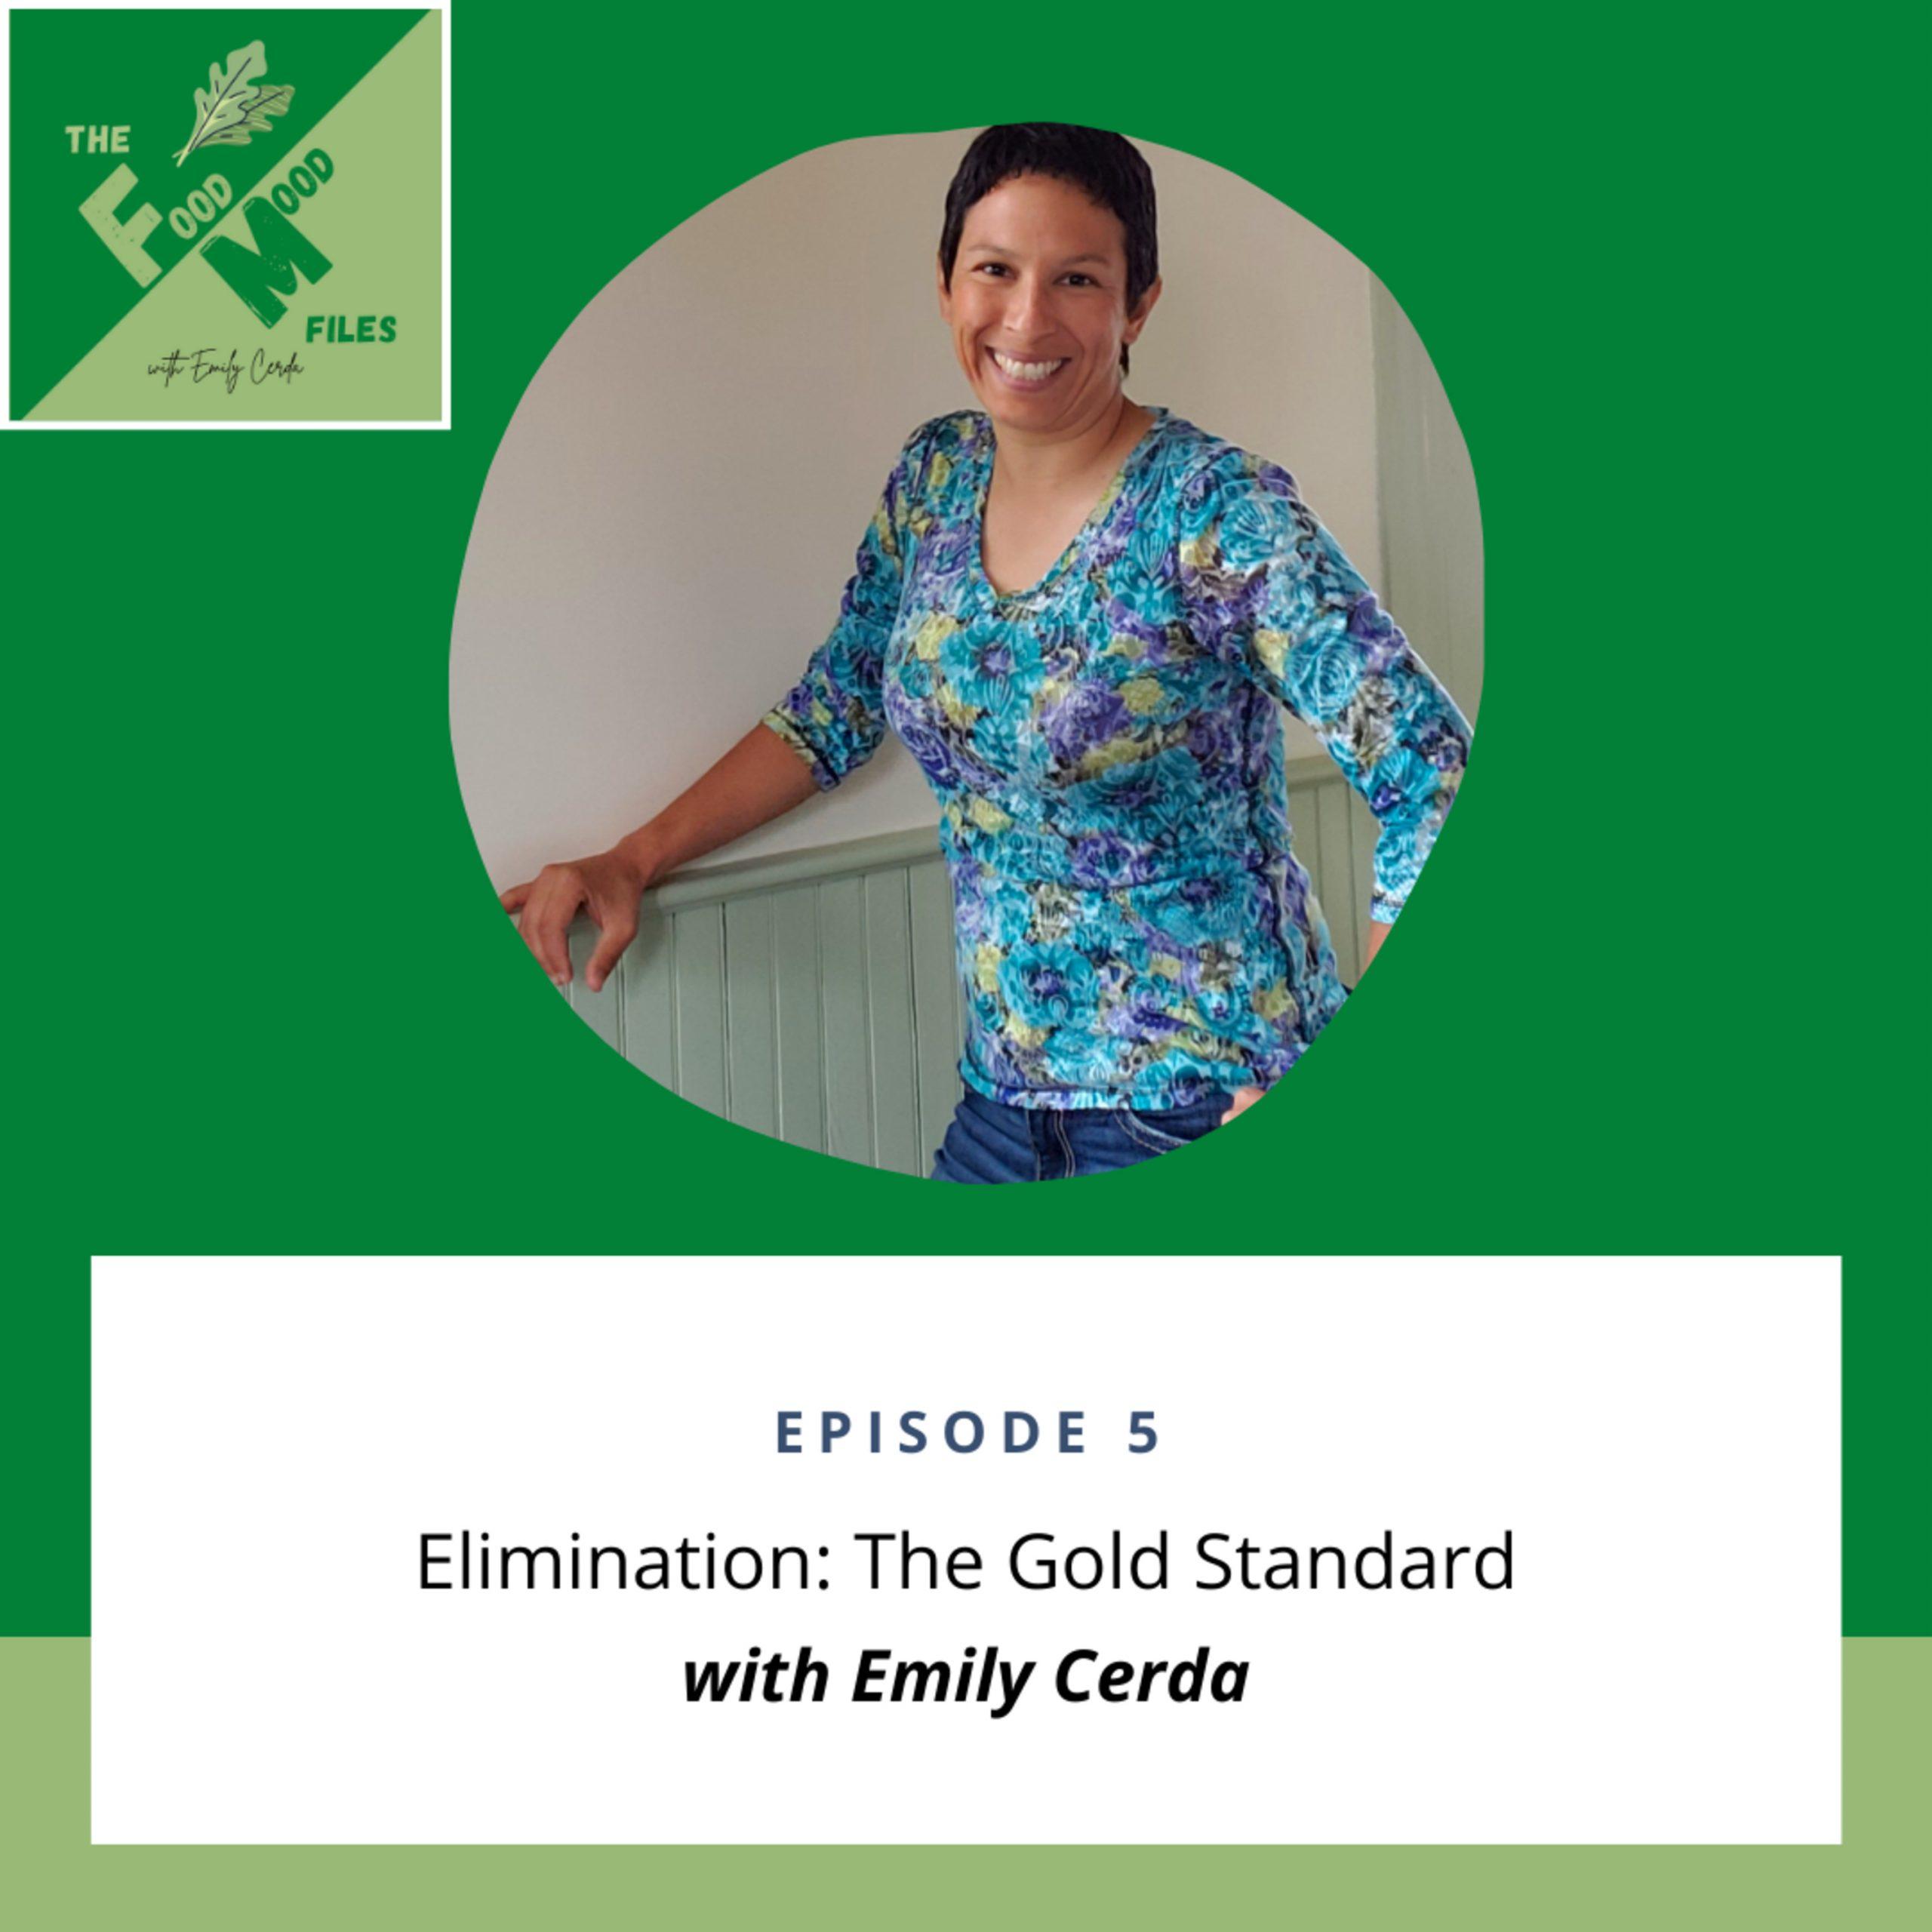 5: Elimination: The Gold Standard